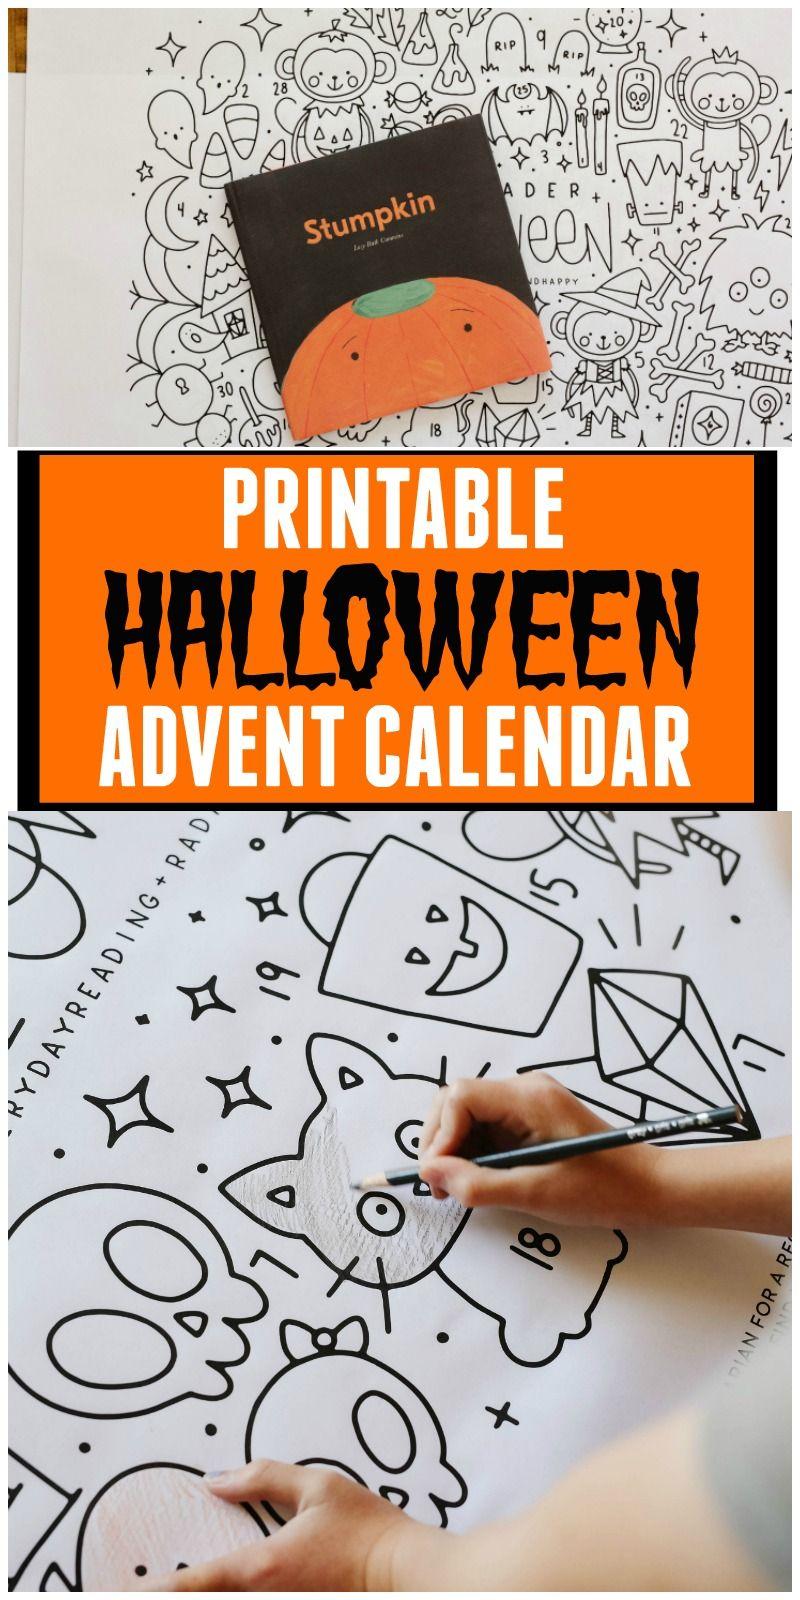 A Halloween Advent Calendar Halloween Advent Halloween Calendar Halloween Advent Calendar [ 1600 x 800 Pixel ]